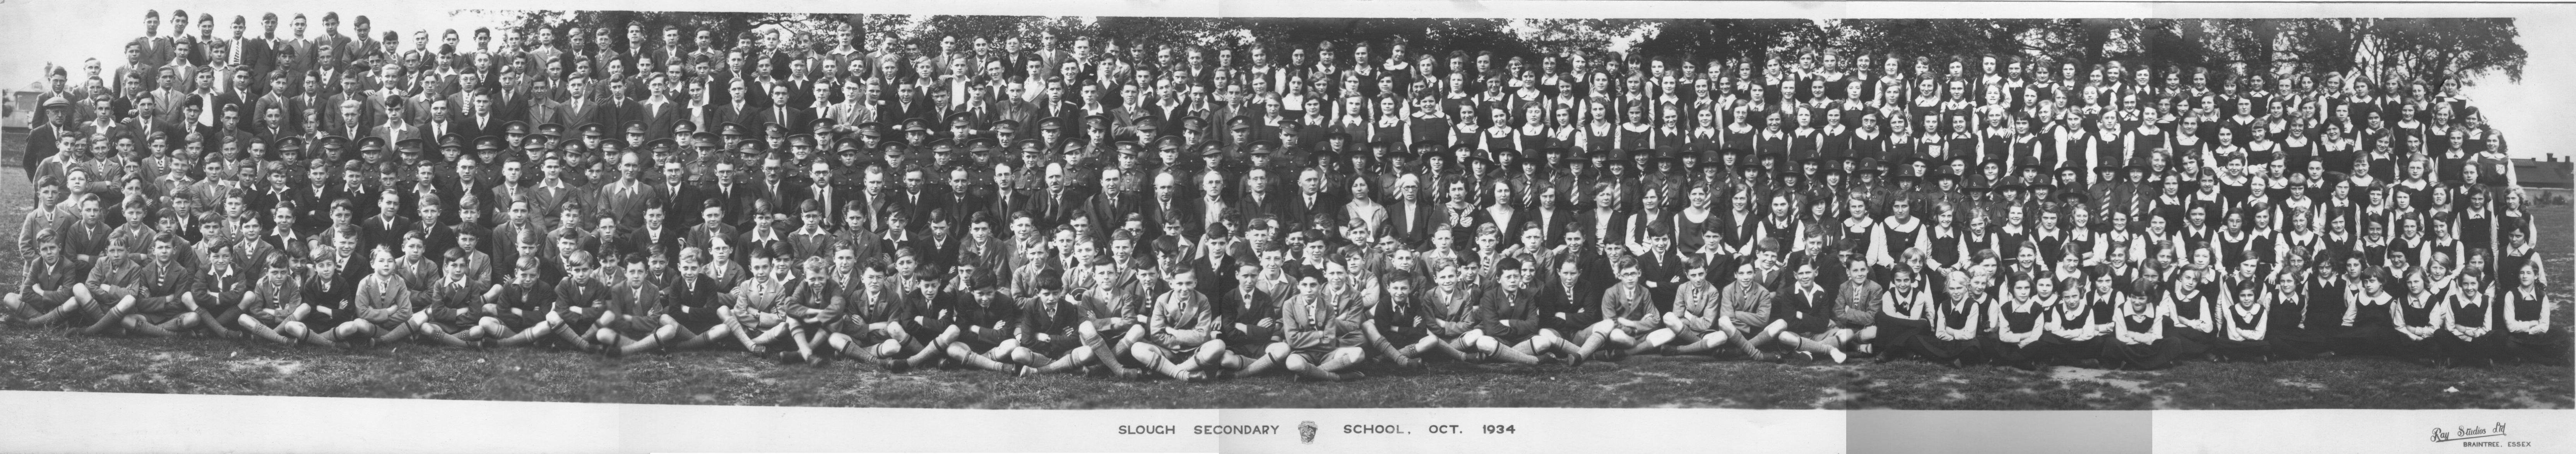 Slough Secondary School. 1934